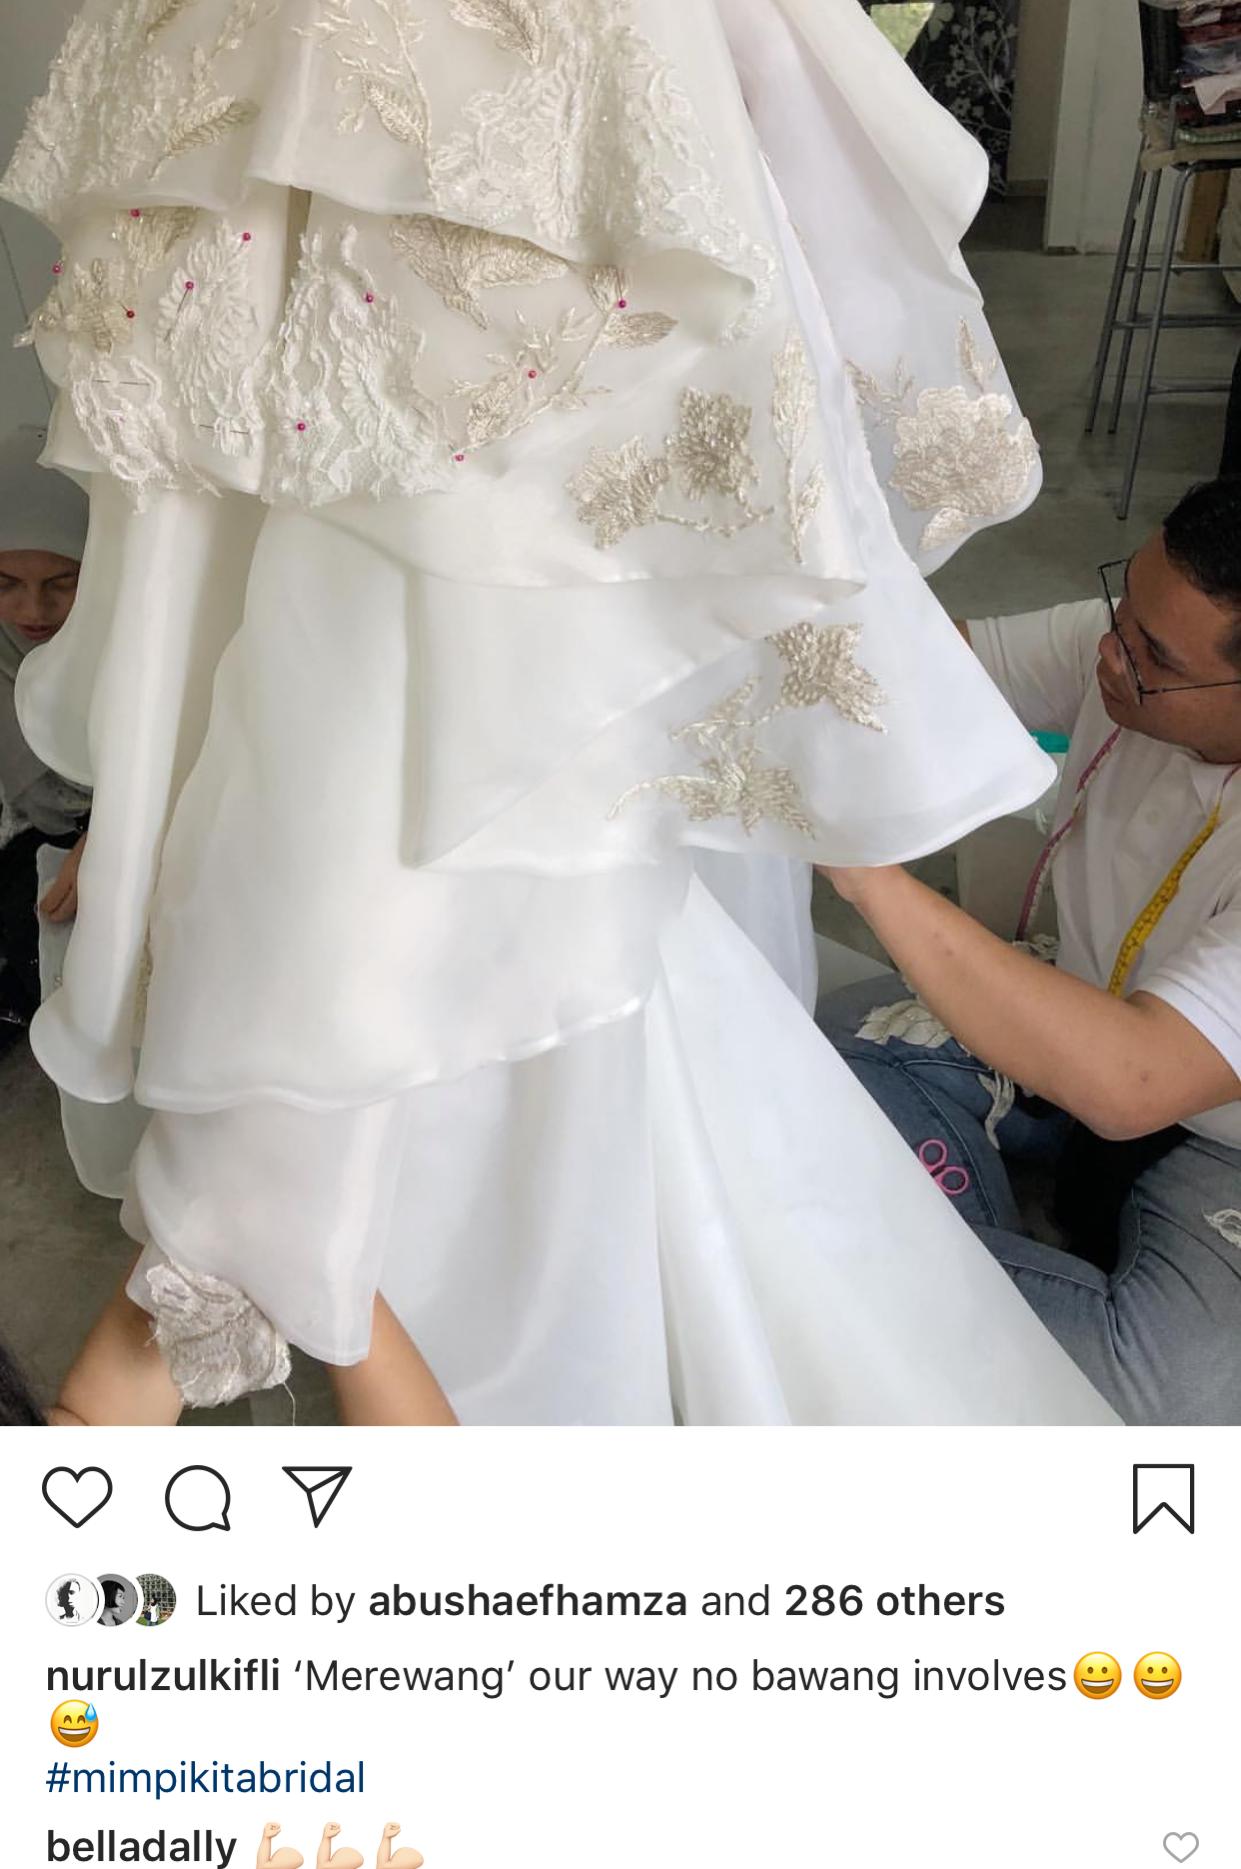 Pelamin, Baju, Pakaian Bridesmaids Cantik! Lihat Details Akad